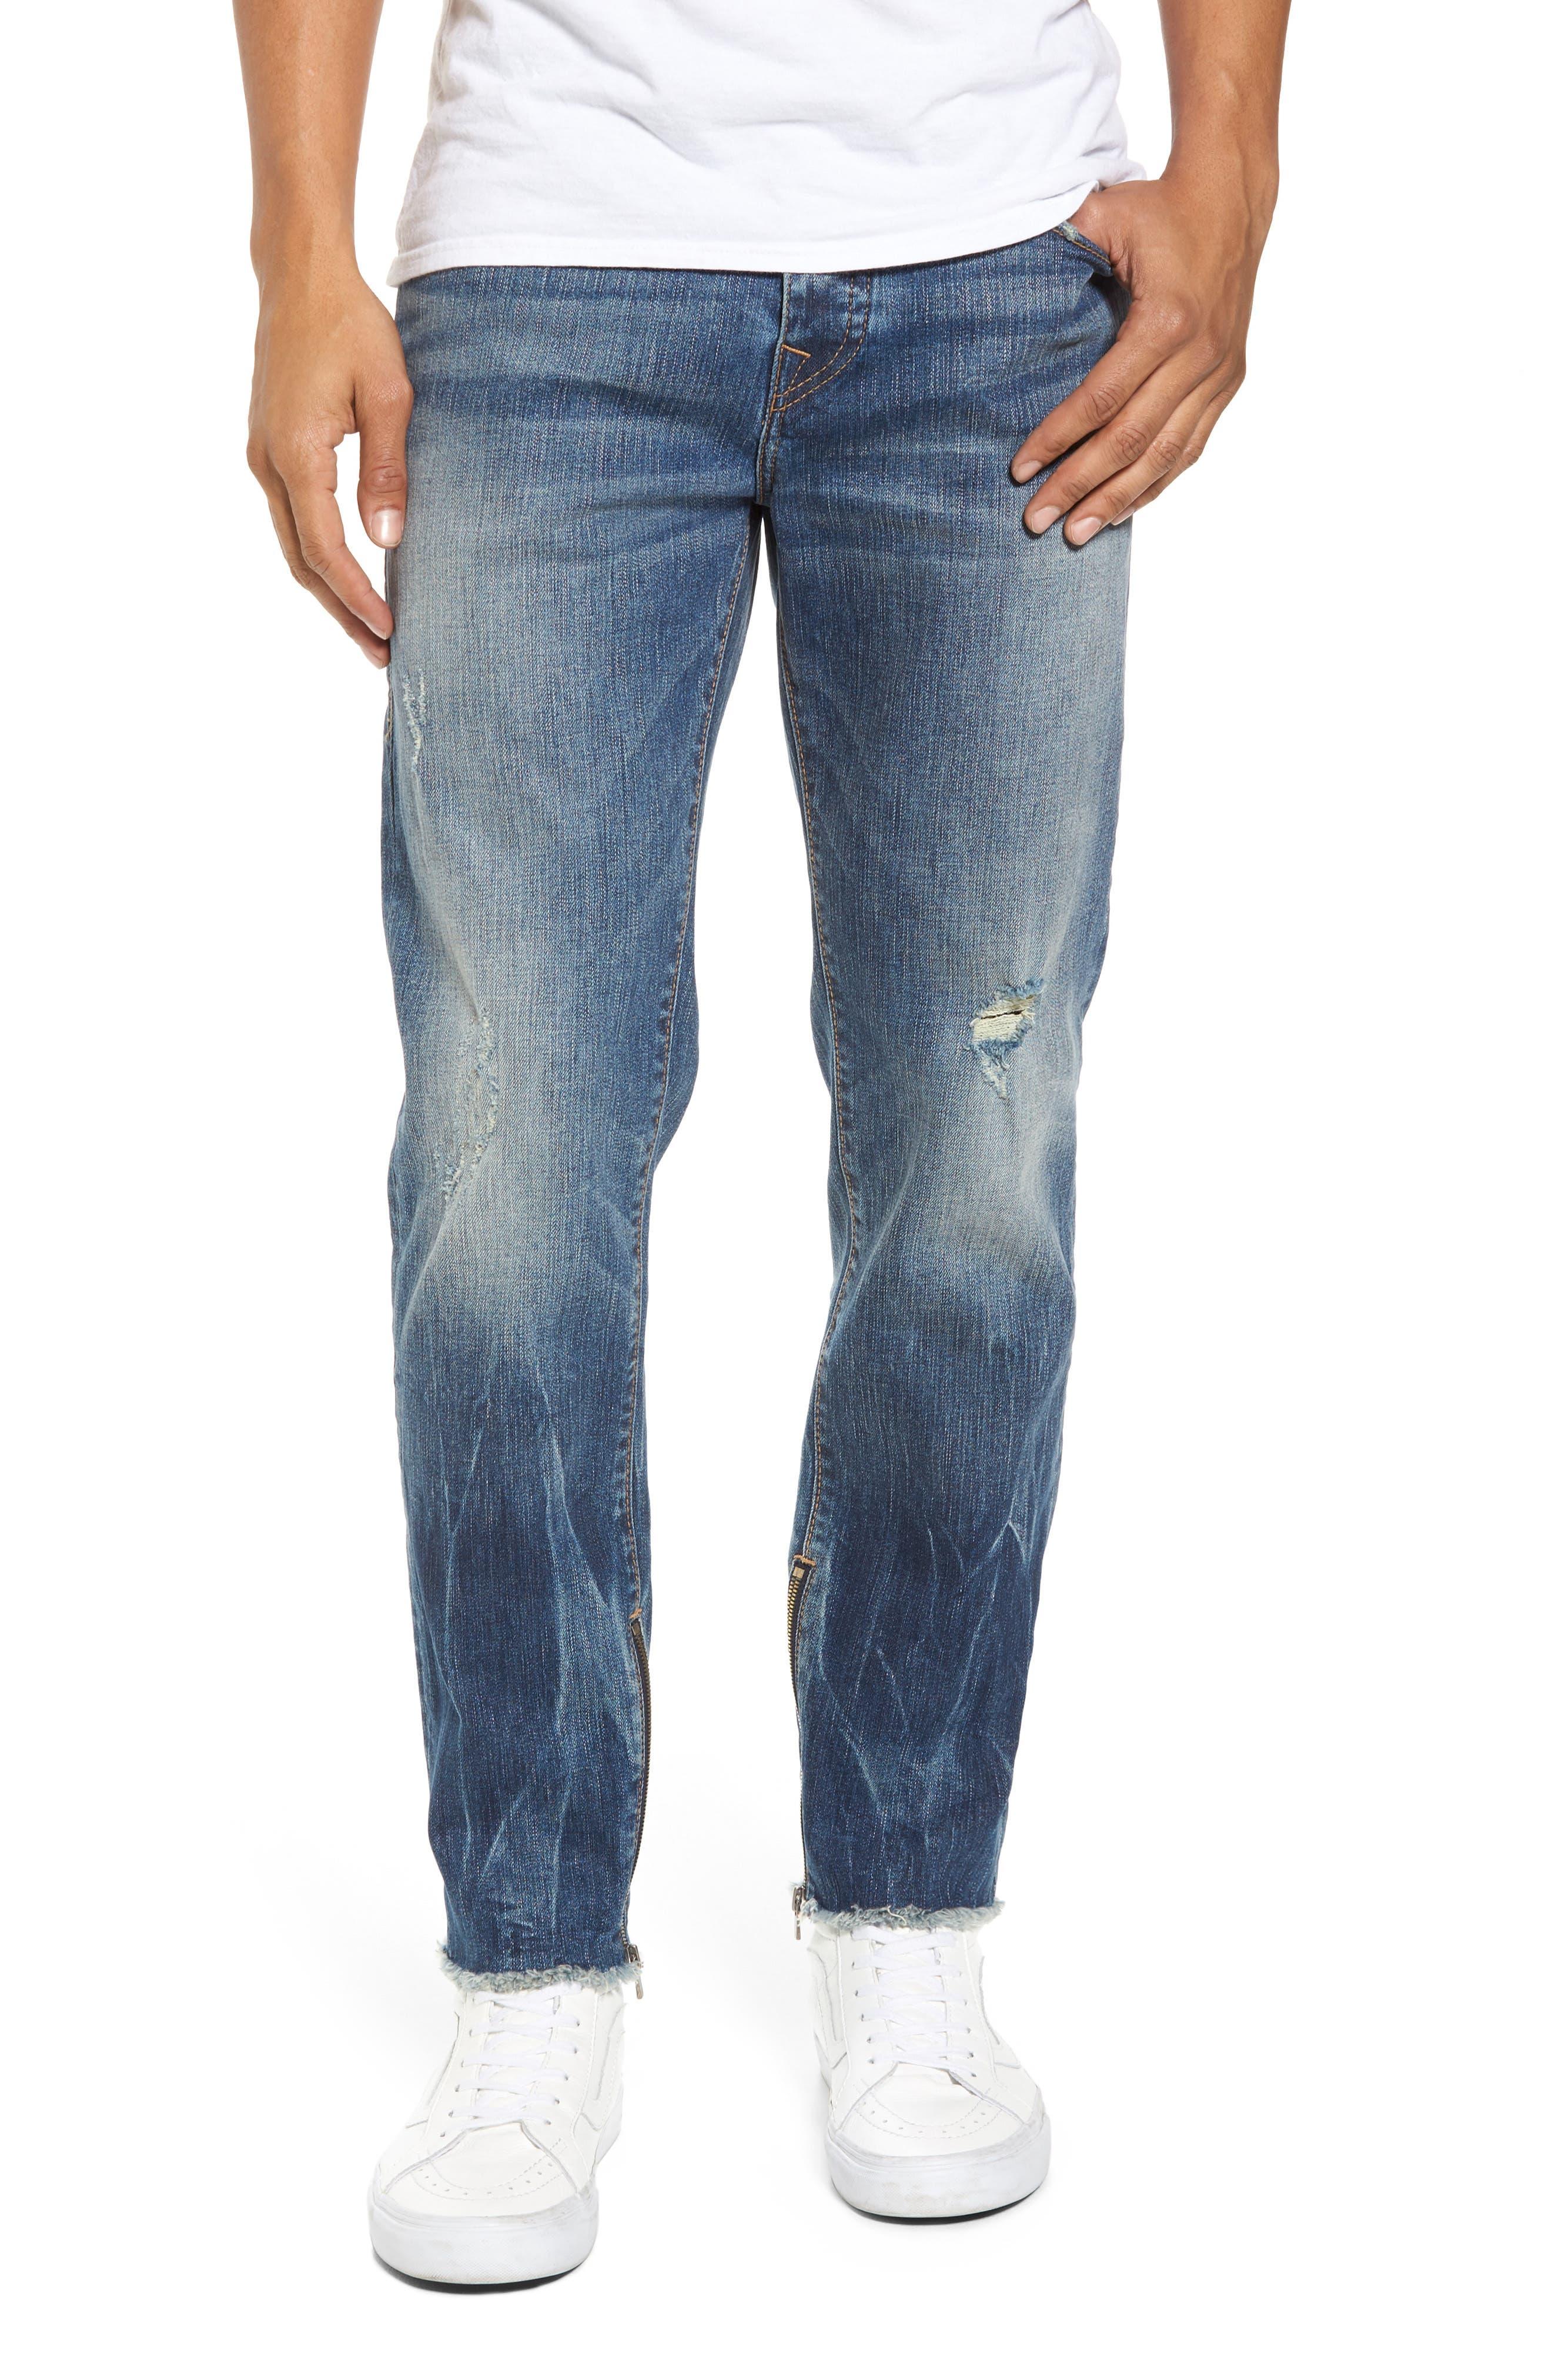 Finn Frayed Skinny Fit Jeans,                         Main,                         color, Envy